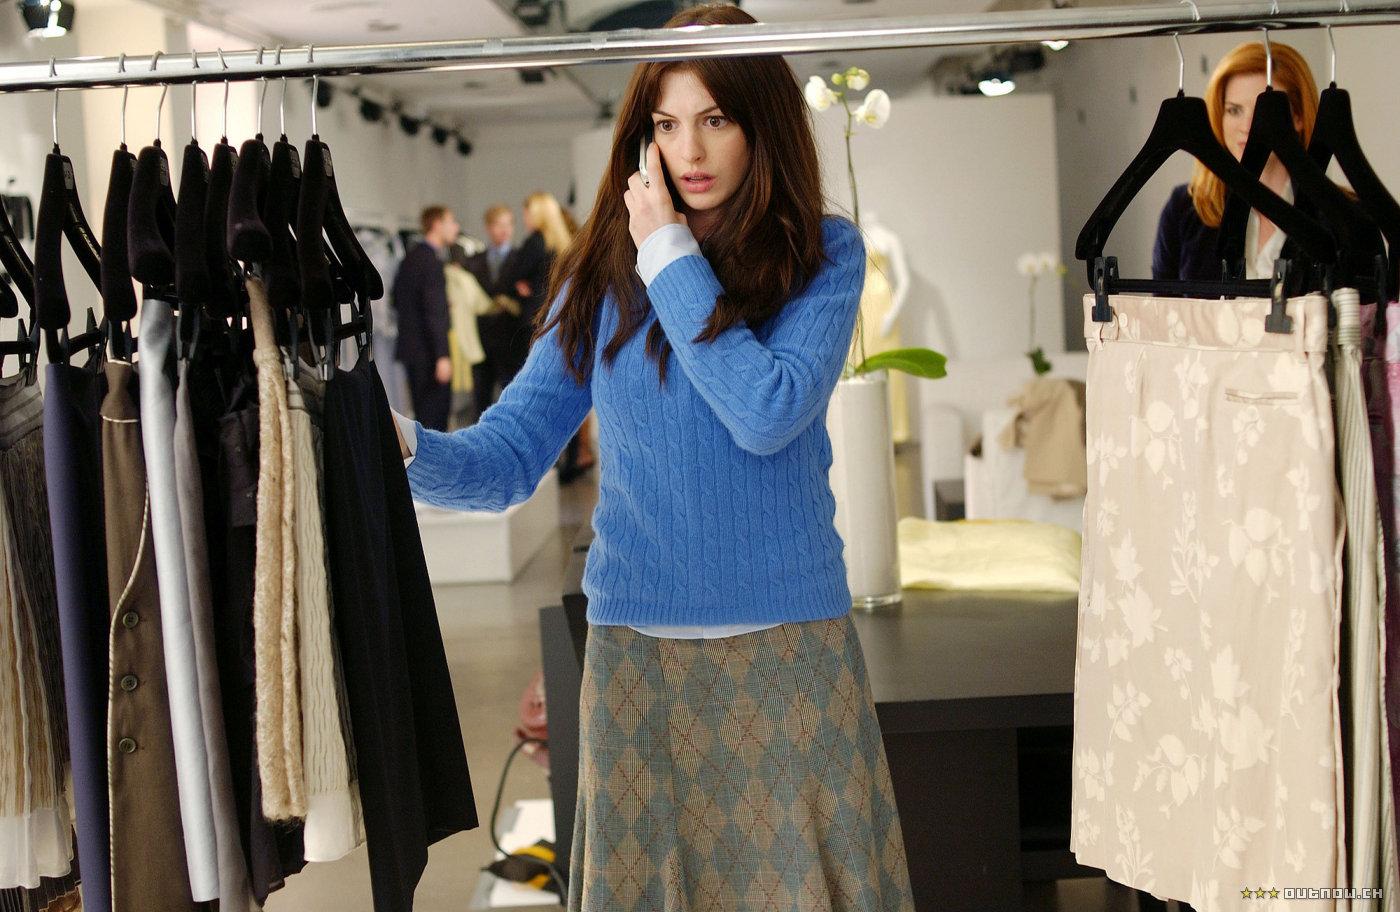 The Devil Wears Prada Fashion | The Fashion Foot